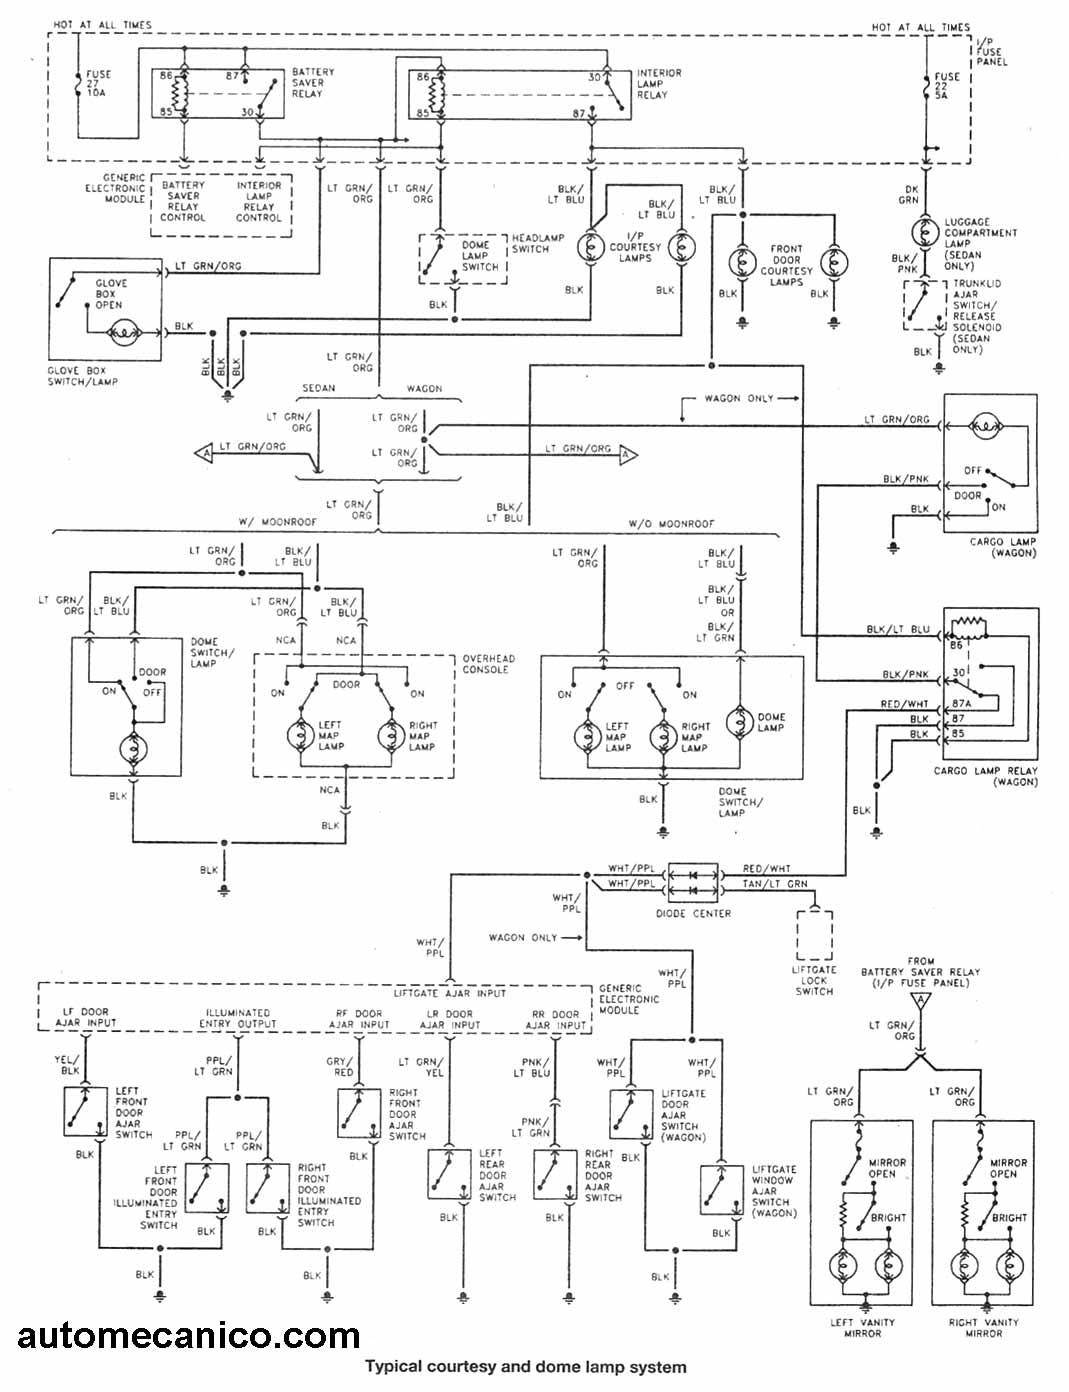 apexi avcr wiring diagram ford 8n 12 volt diagramas de un relay 1996 information of